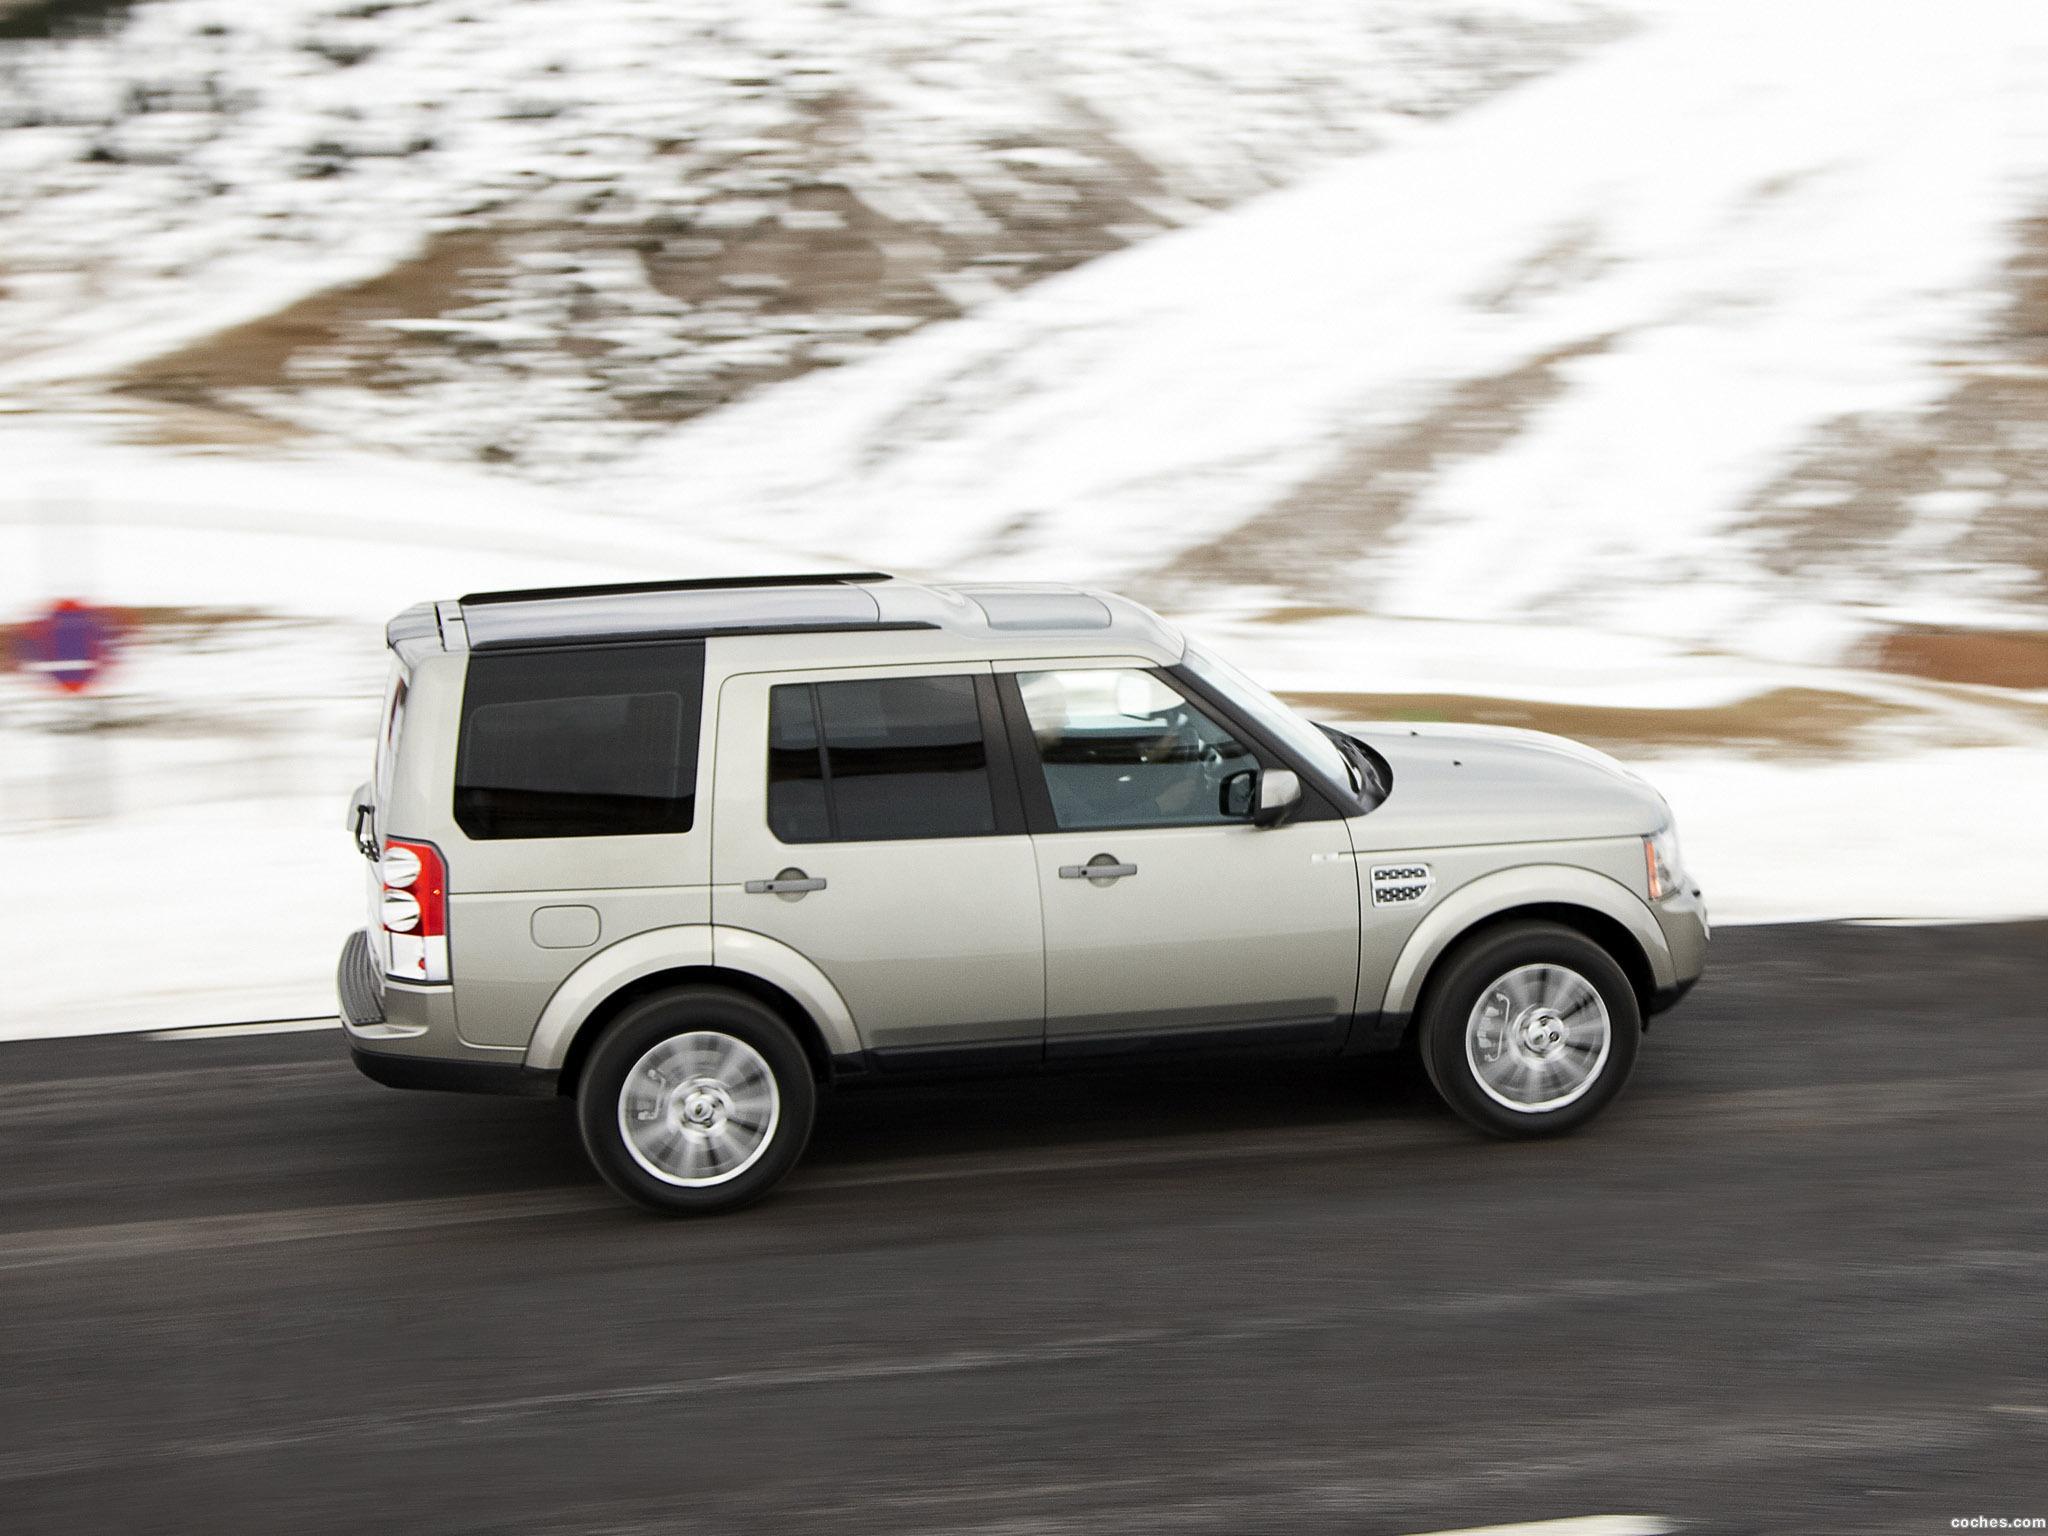 Foto 1 de Land Rover Discovery 4 3.0 TDV6 2009